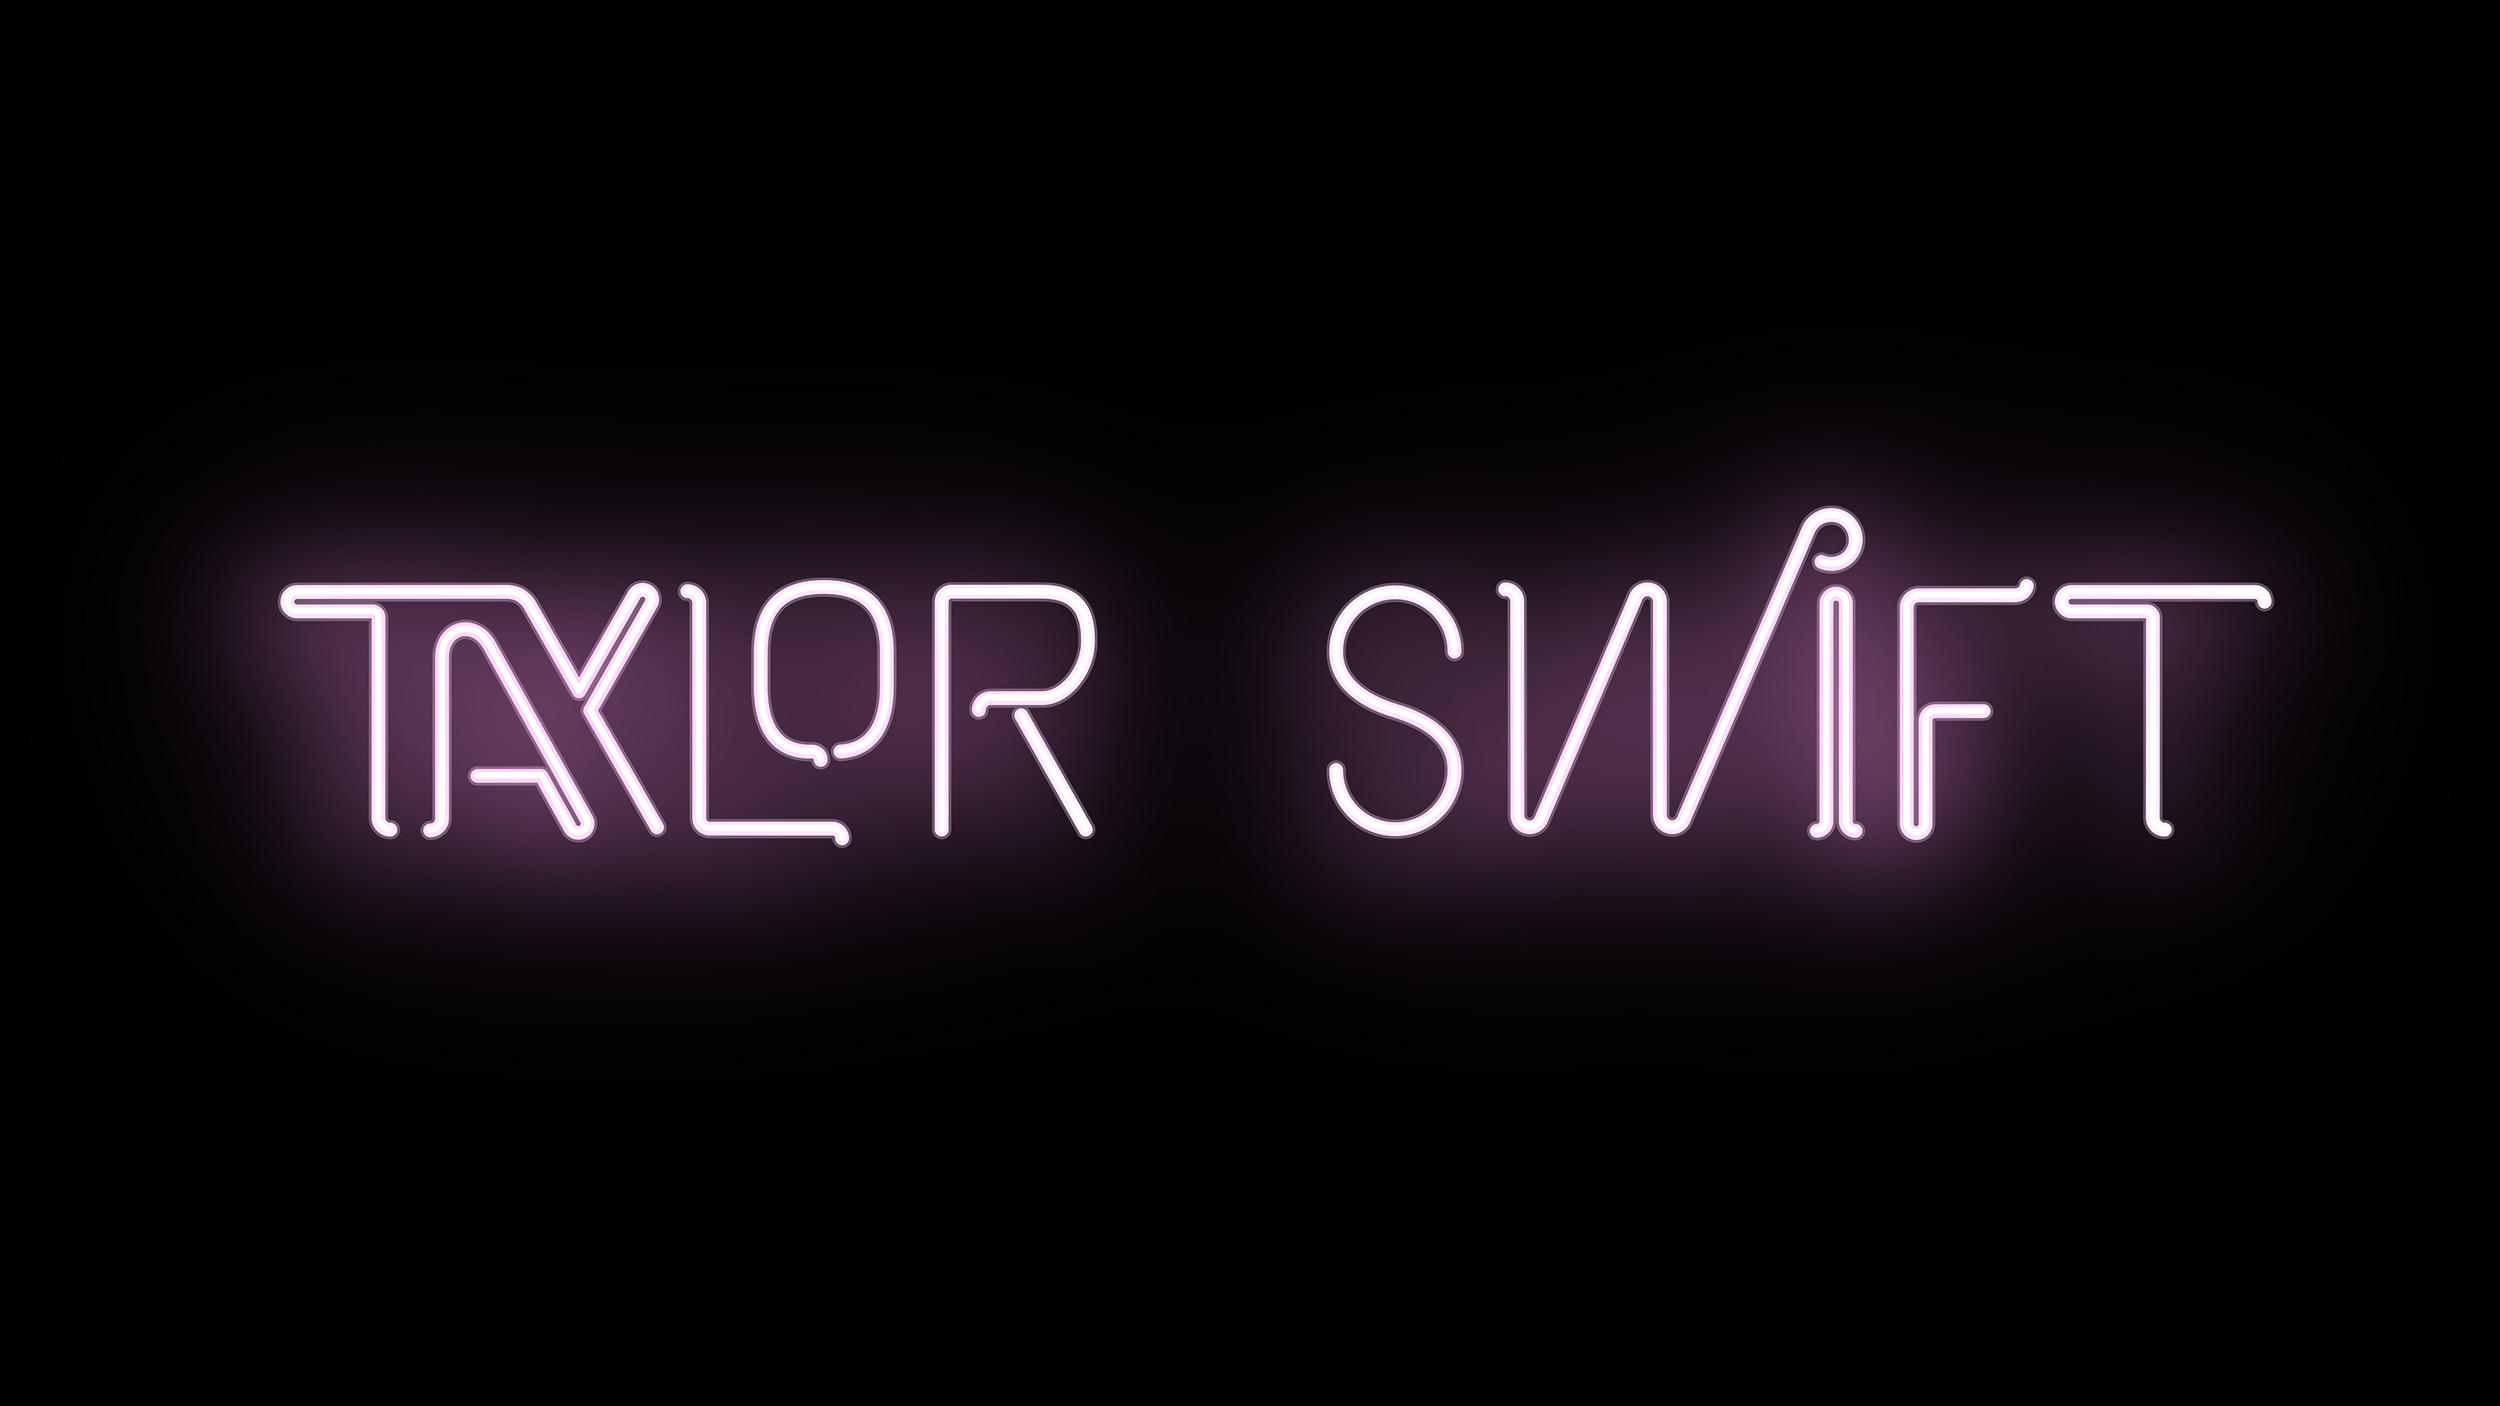 Taylor Swift Logos